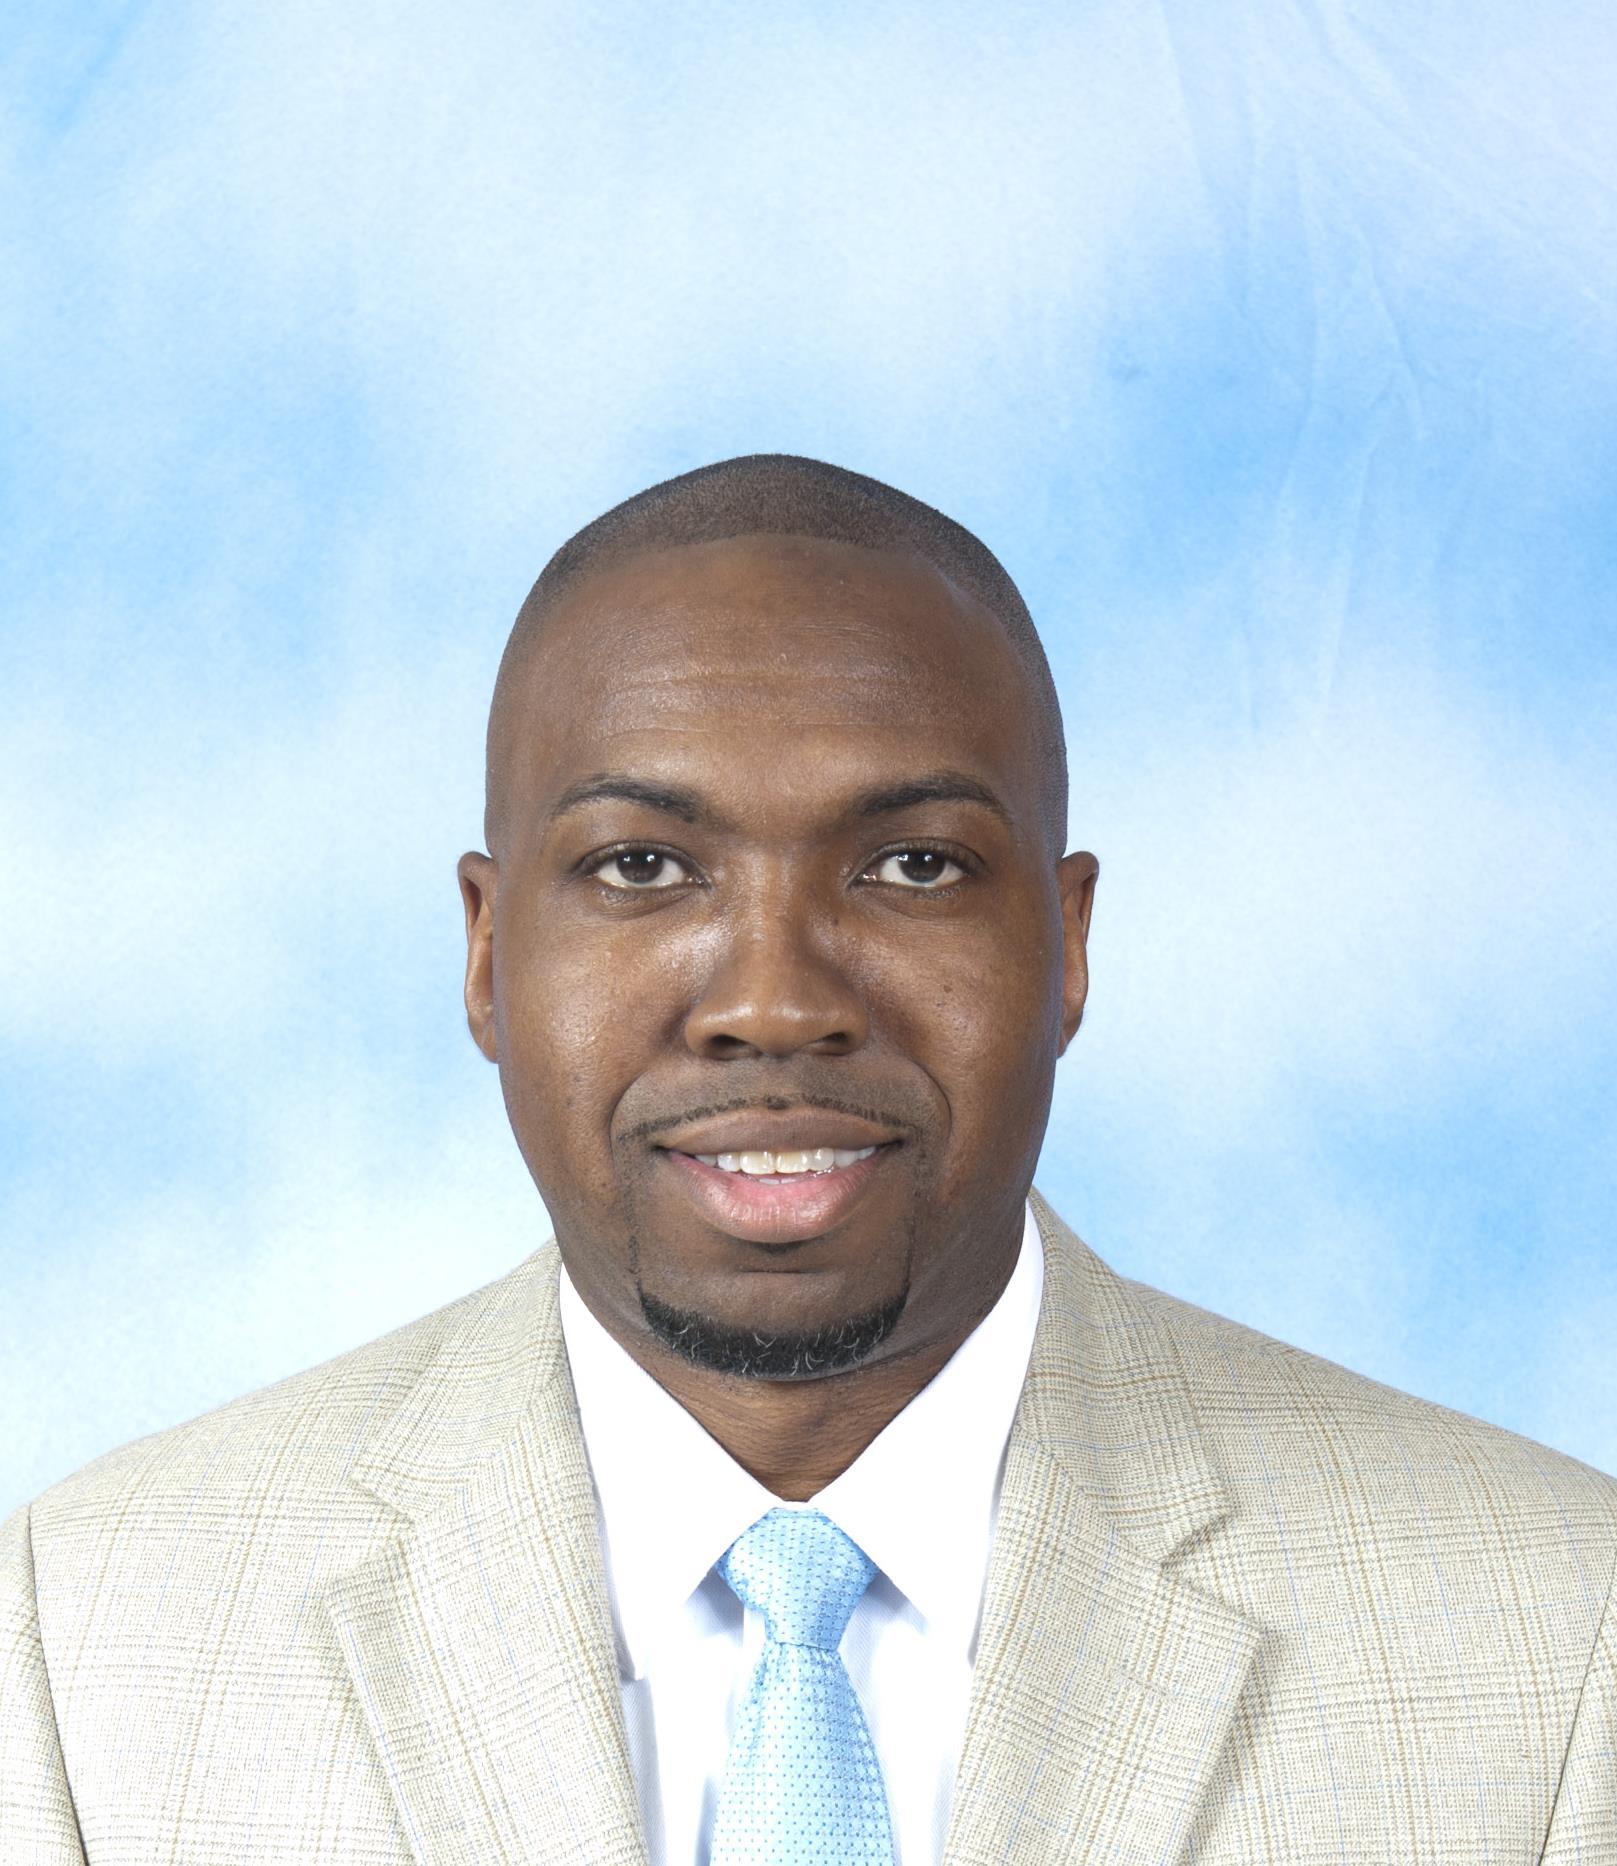 Travis Jackson